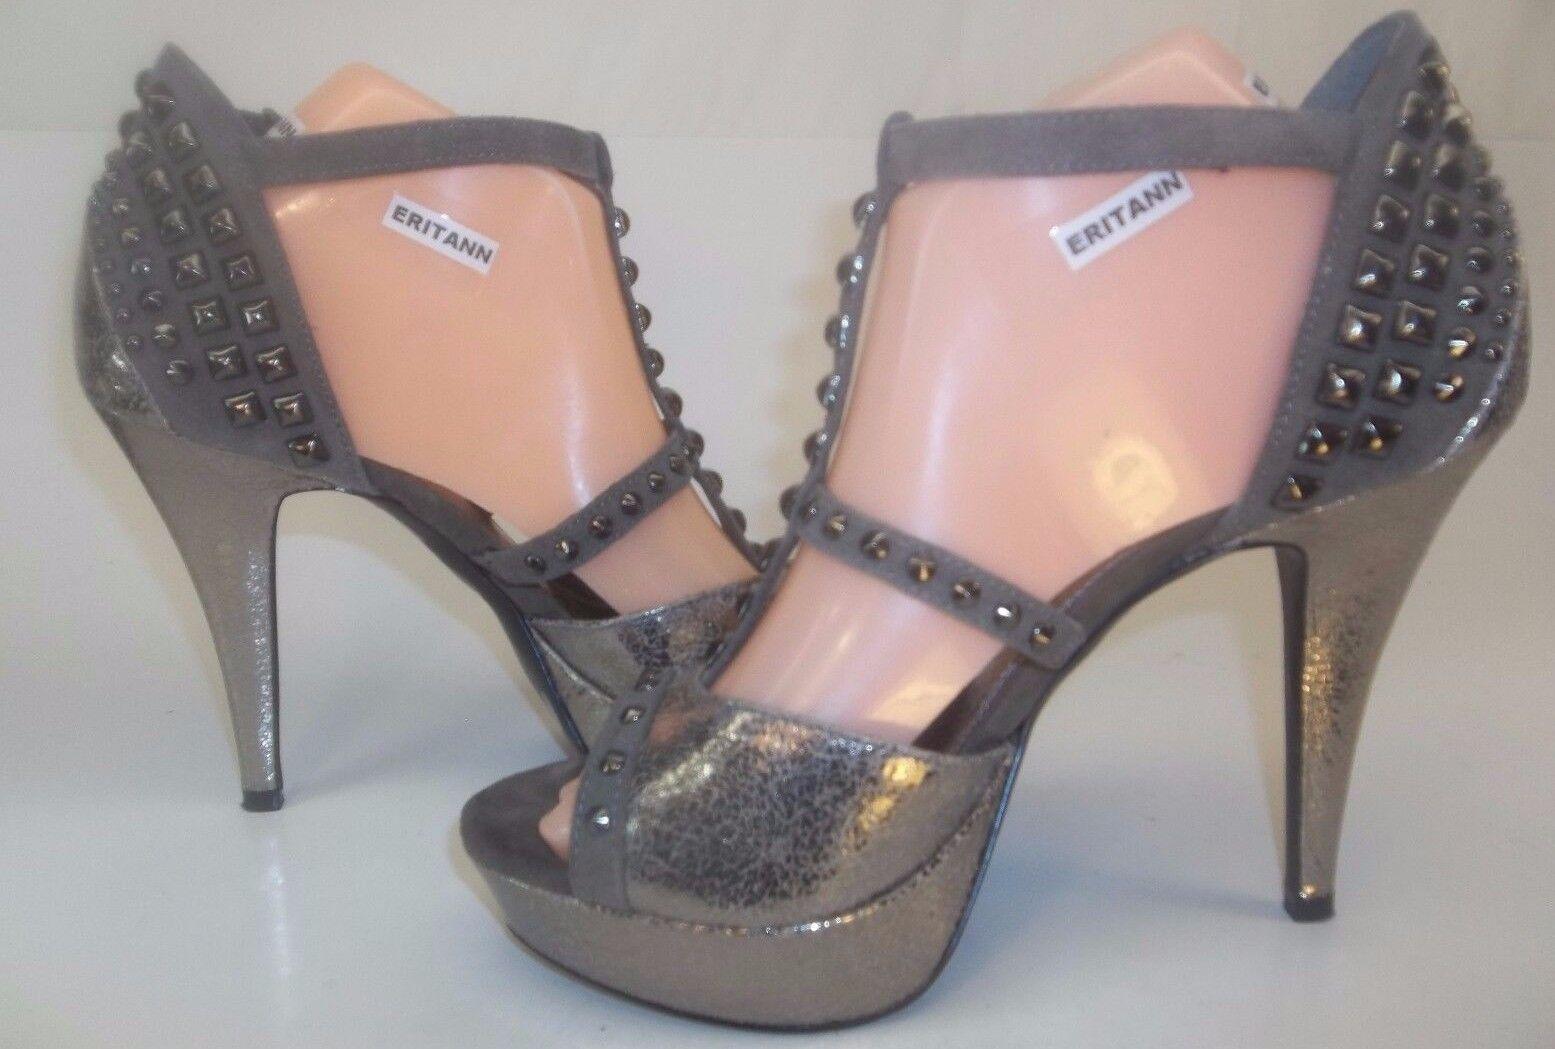 Gianni Bini Wos Heels Metallic Platform US 8.5M Gray Metallic Heels Crackle Studded Ankle Strap bb3b6b